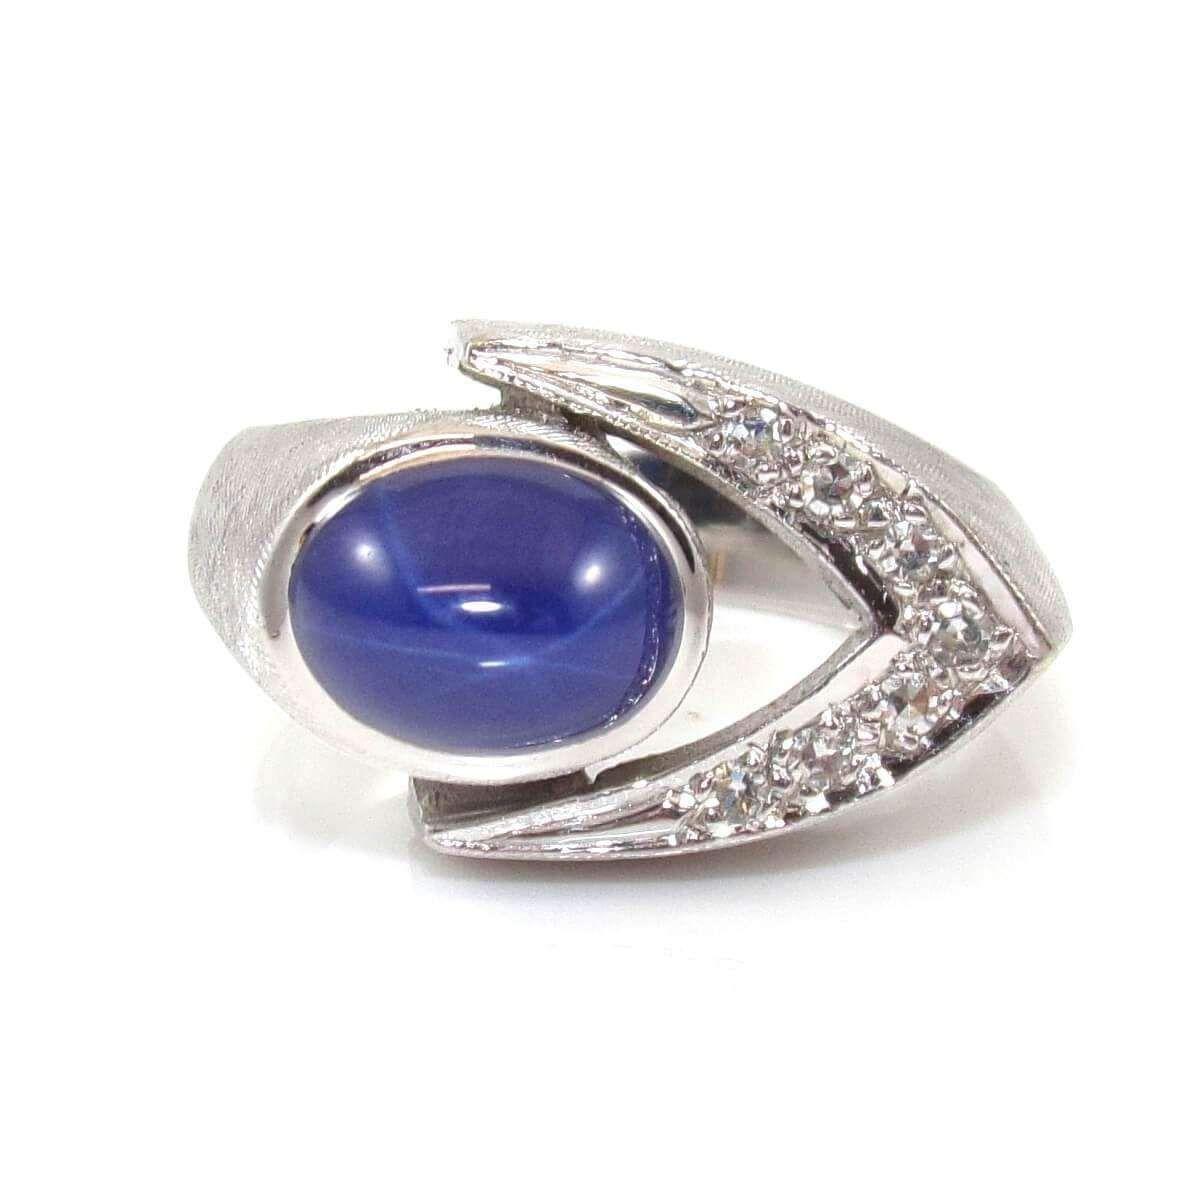 14k White Gold Natural Diamond Lindy Star Sapphire Ring Size 7 5 Star Sapphire Ring Sapphire Ring Rings